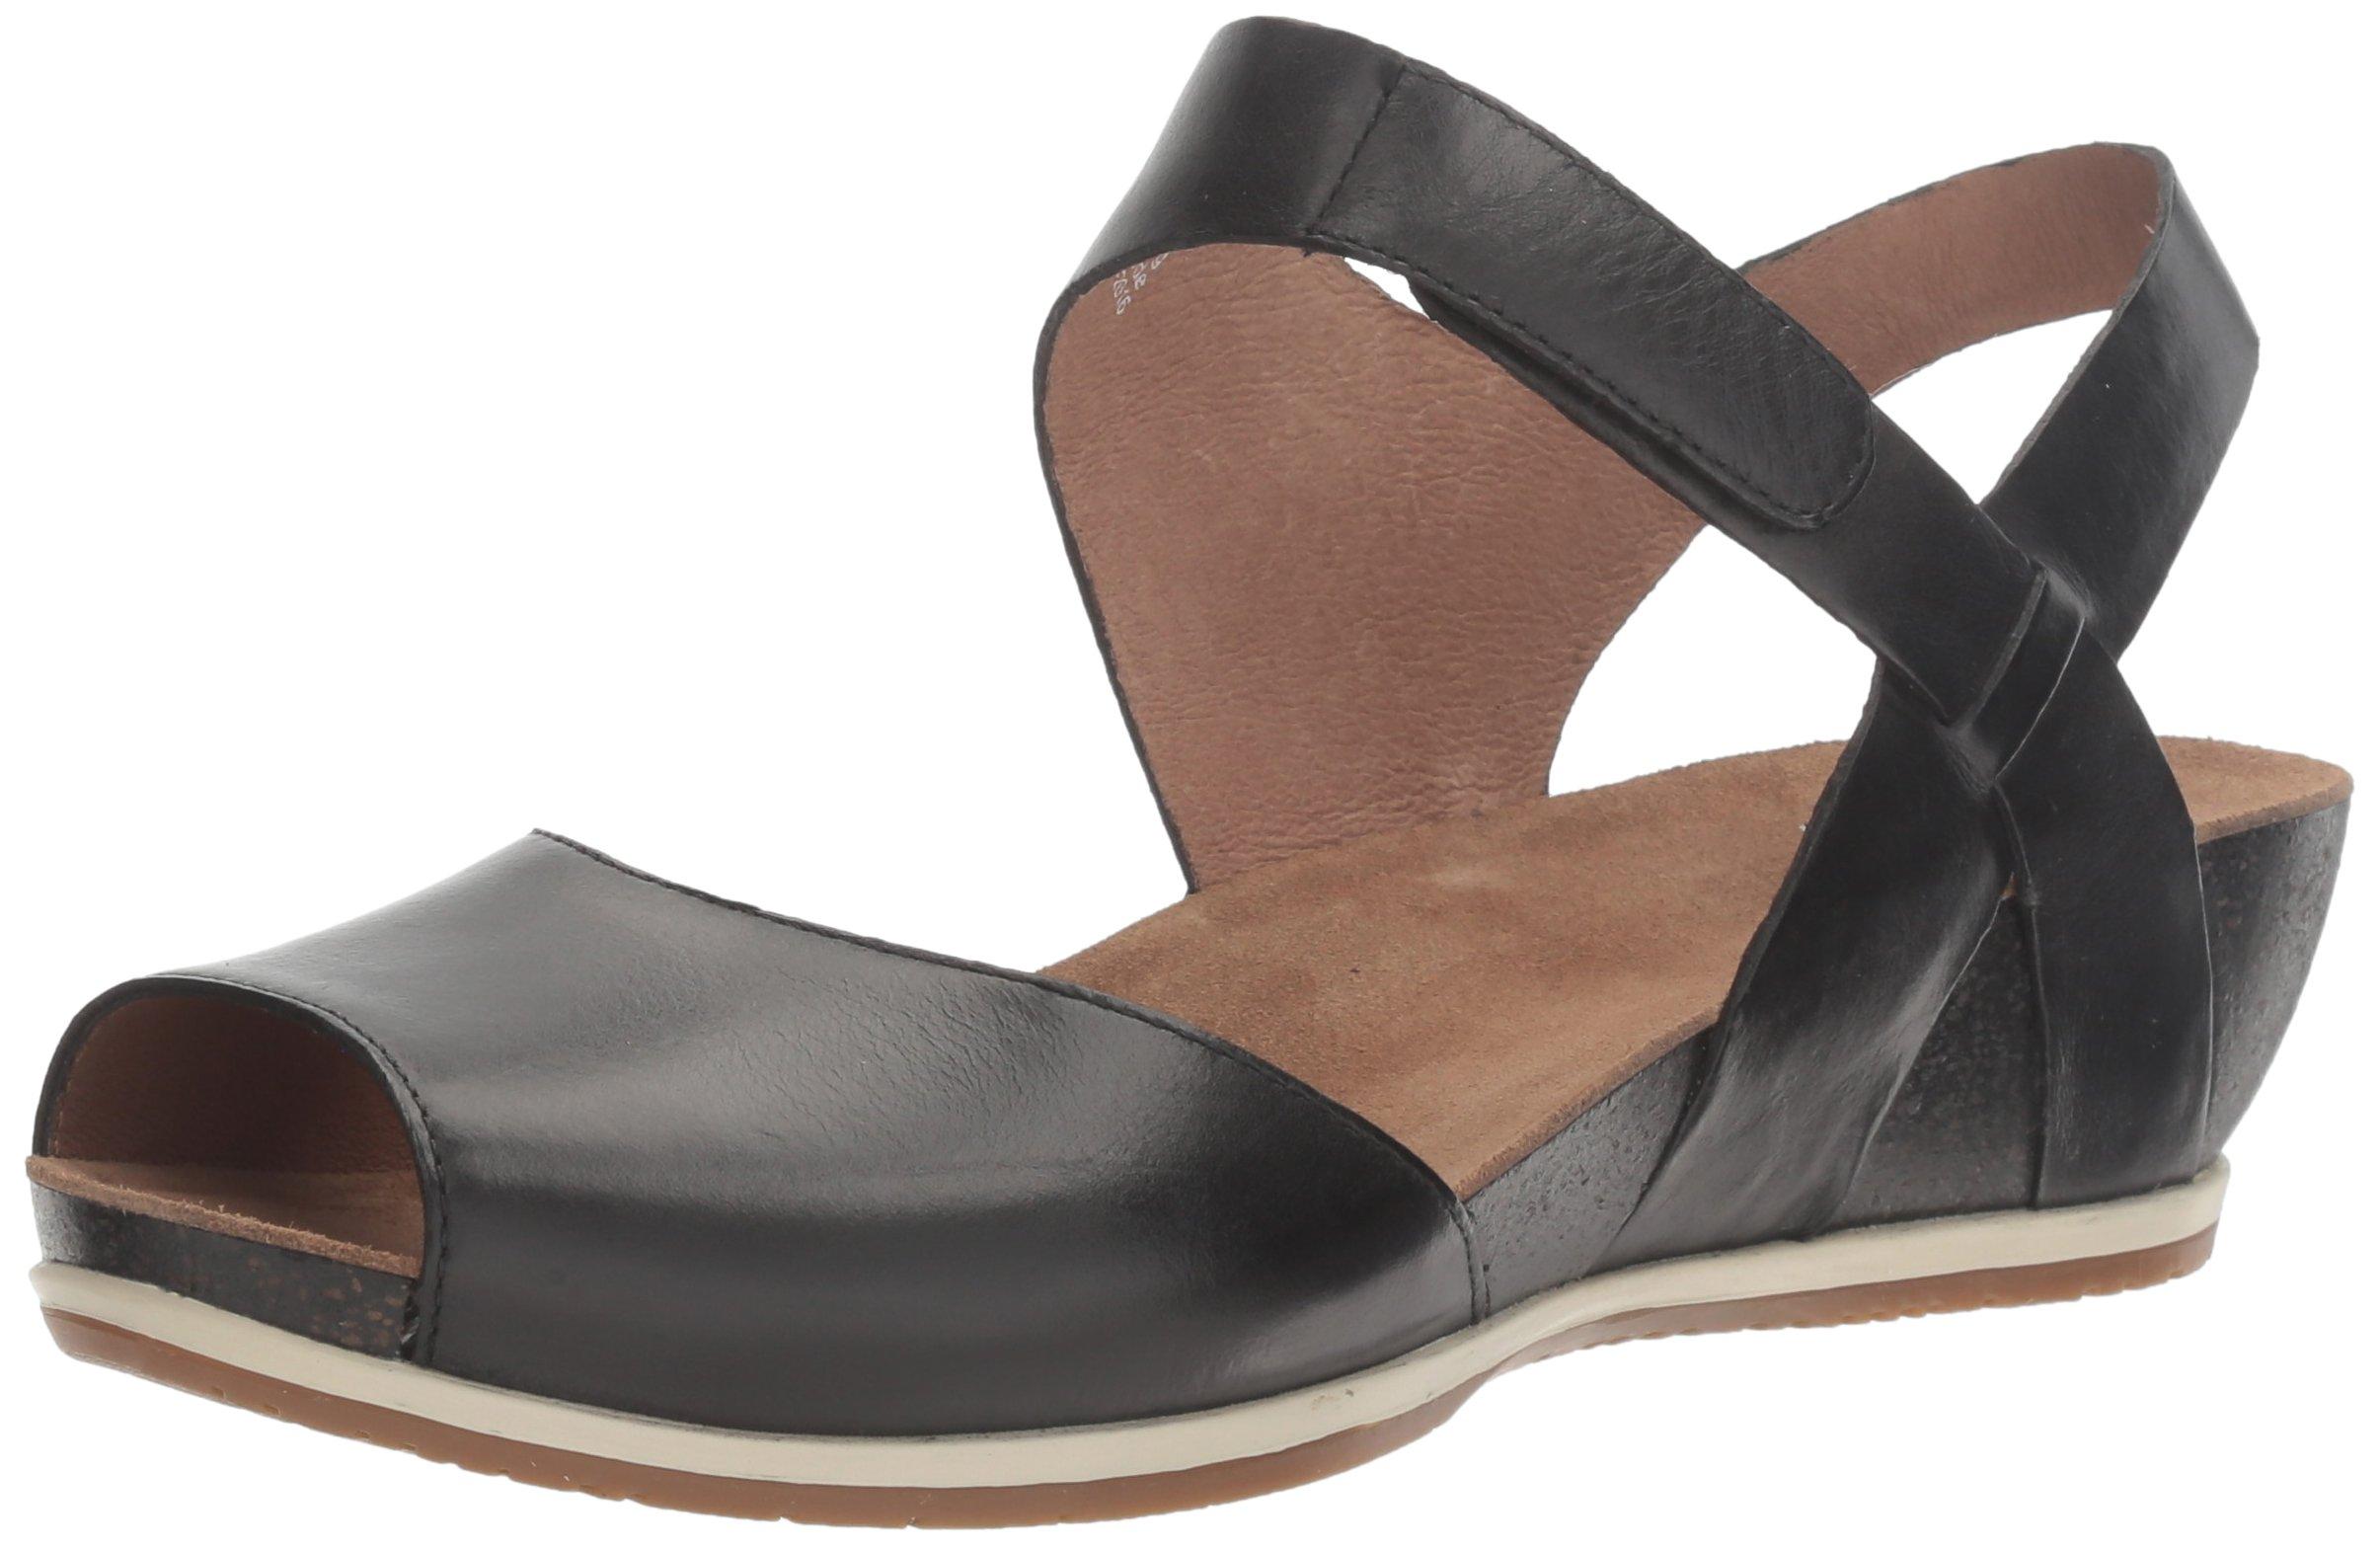 Dansko Women's Vera Flat Sandal, Black Burnished, 37 M EU (6.5-7 US) by Dansko